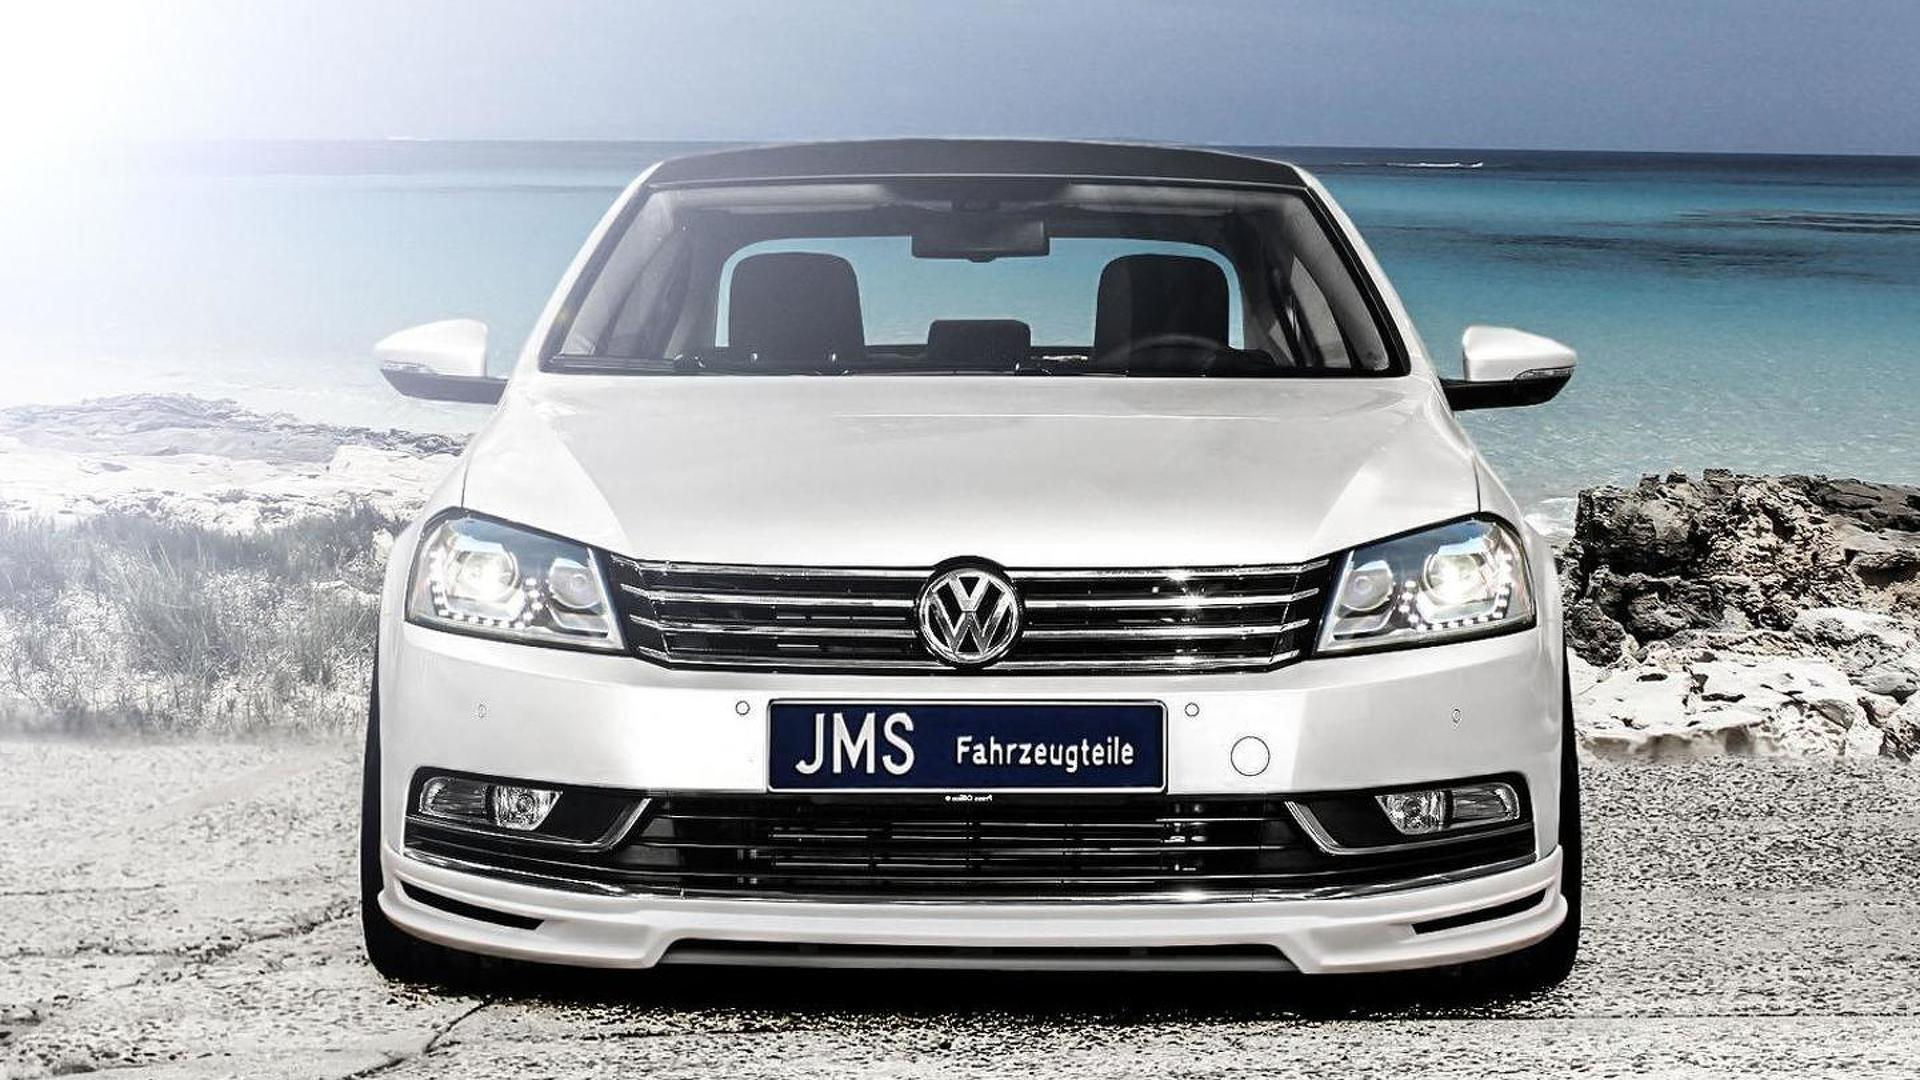 Тюнинг Volkswagen Passat B7 от JMS